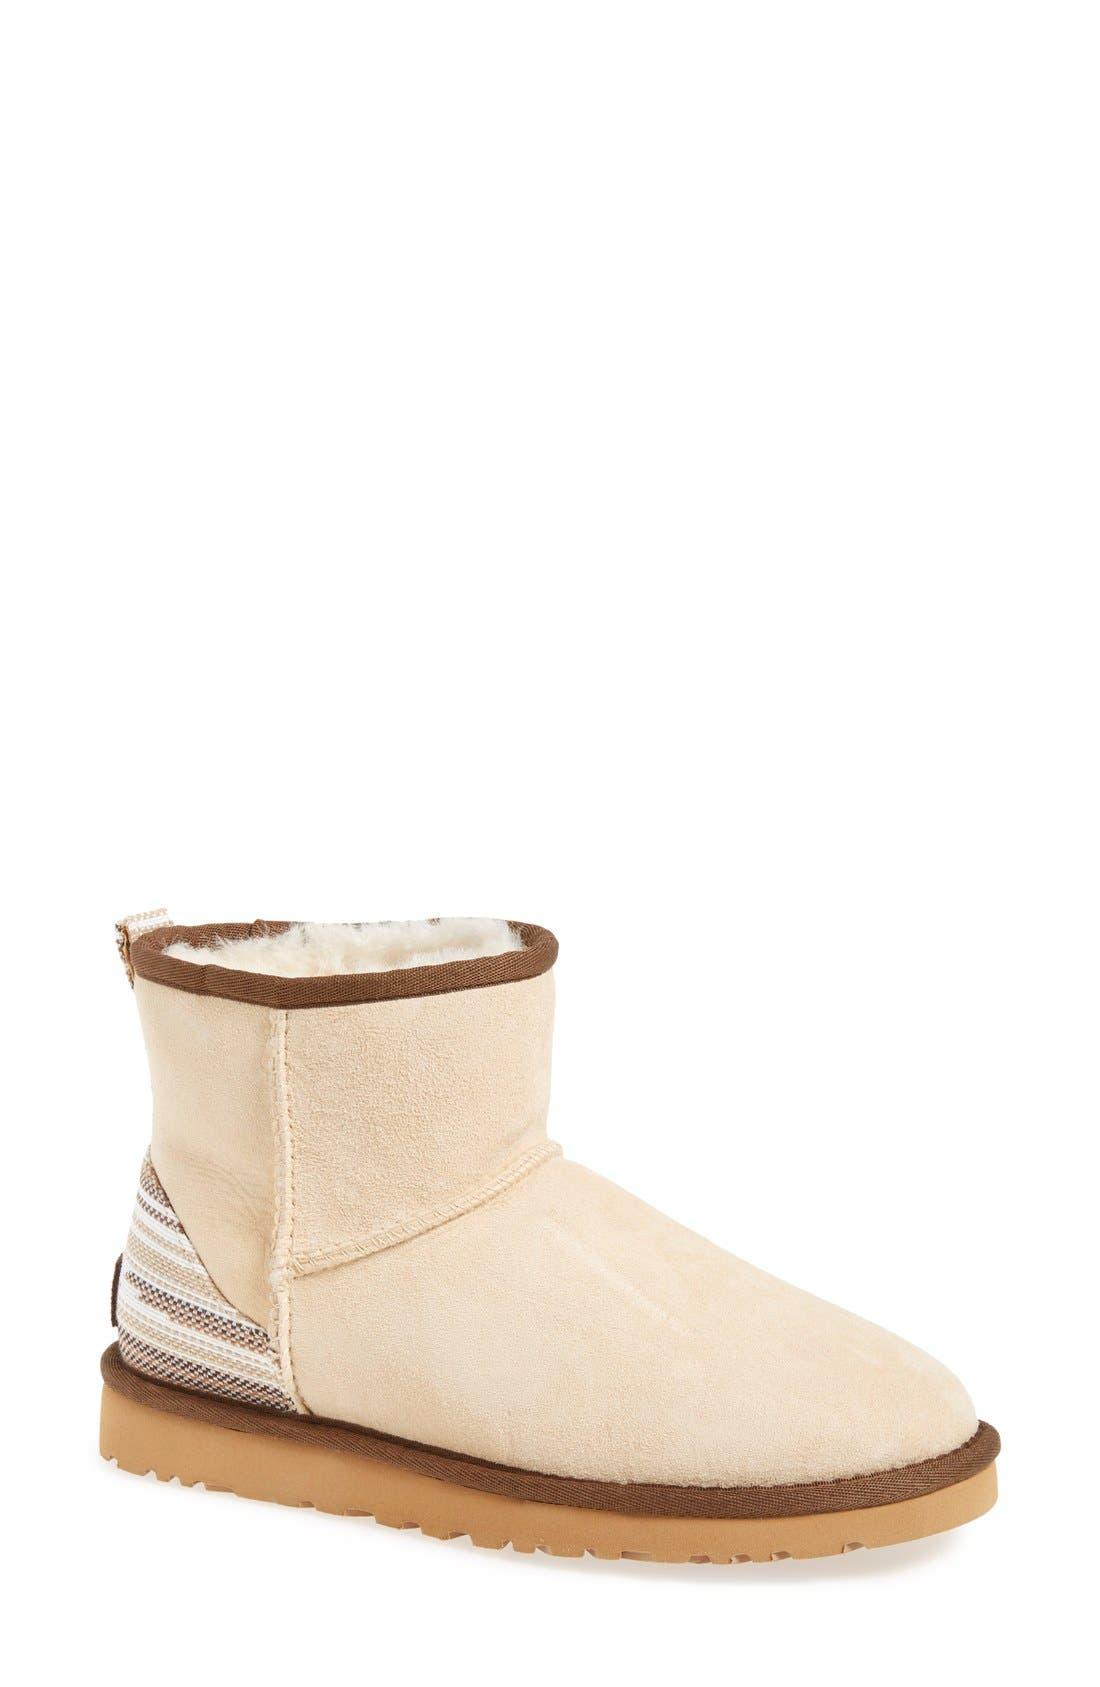 Main Image - UGG® 'Classic Mini Serape' Genuine Shearling Lined Boot (Women)